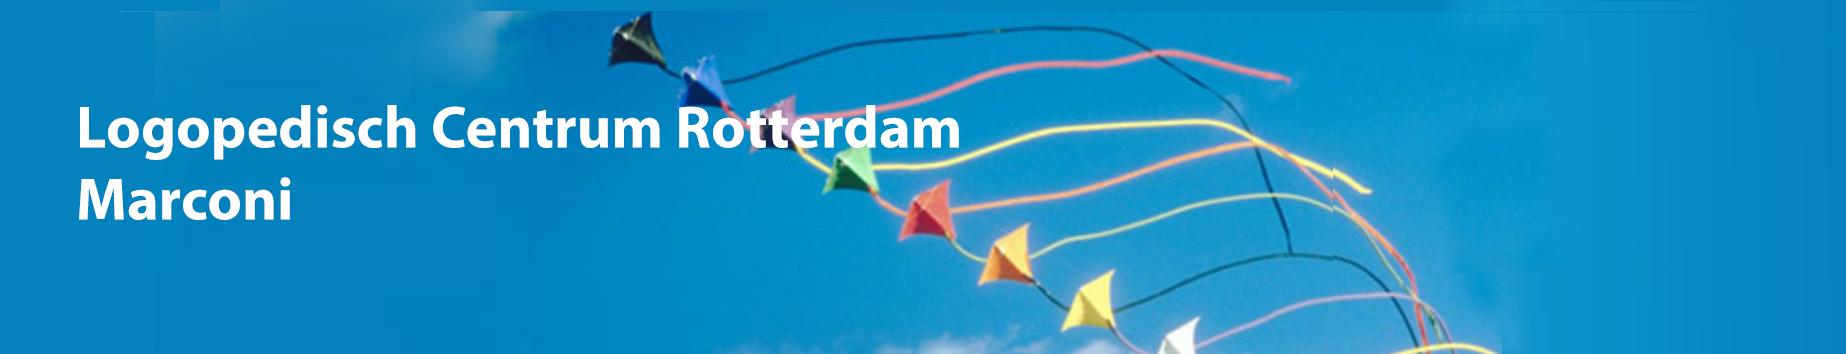 Logopediepraktijk Rotterdam